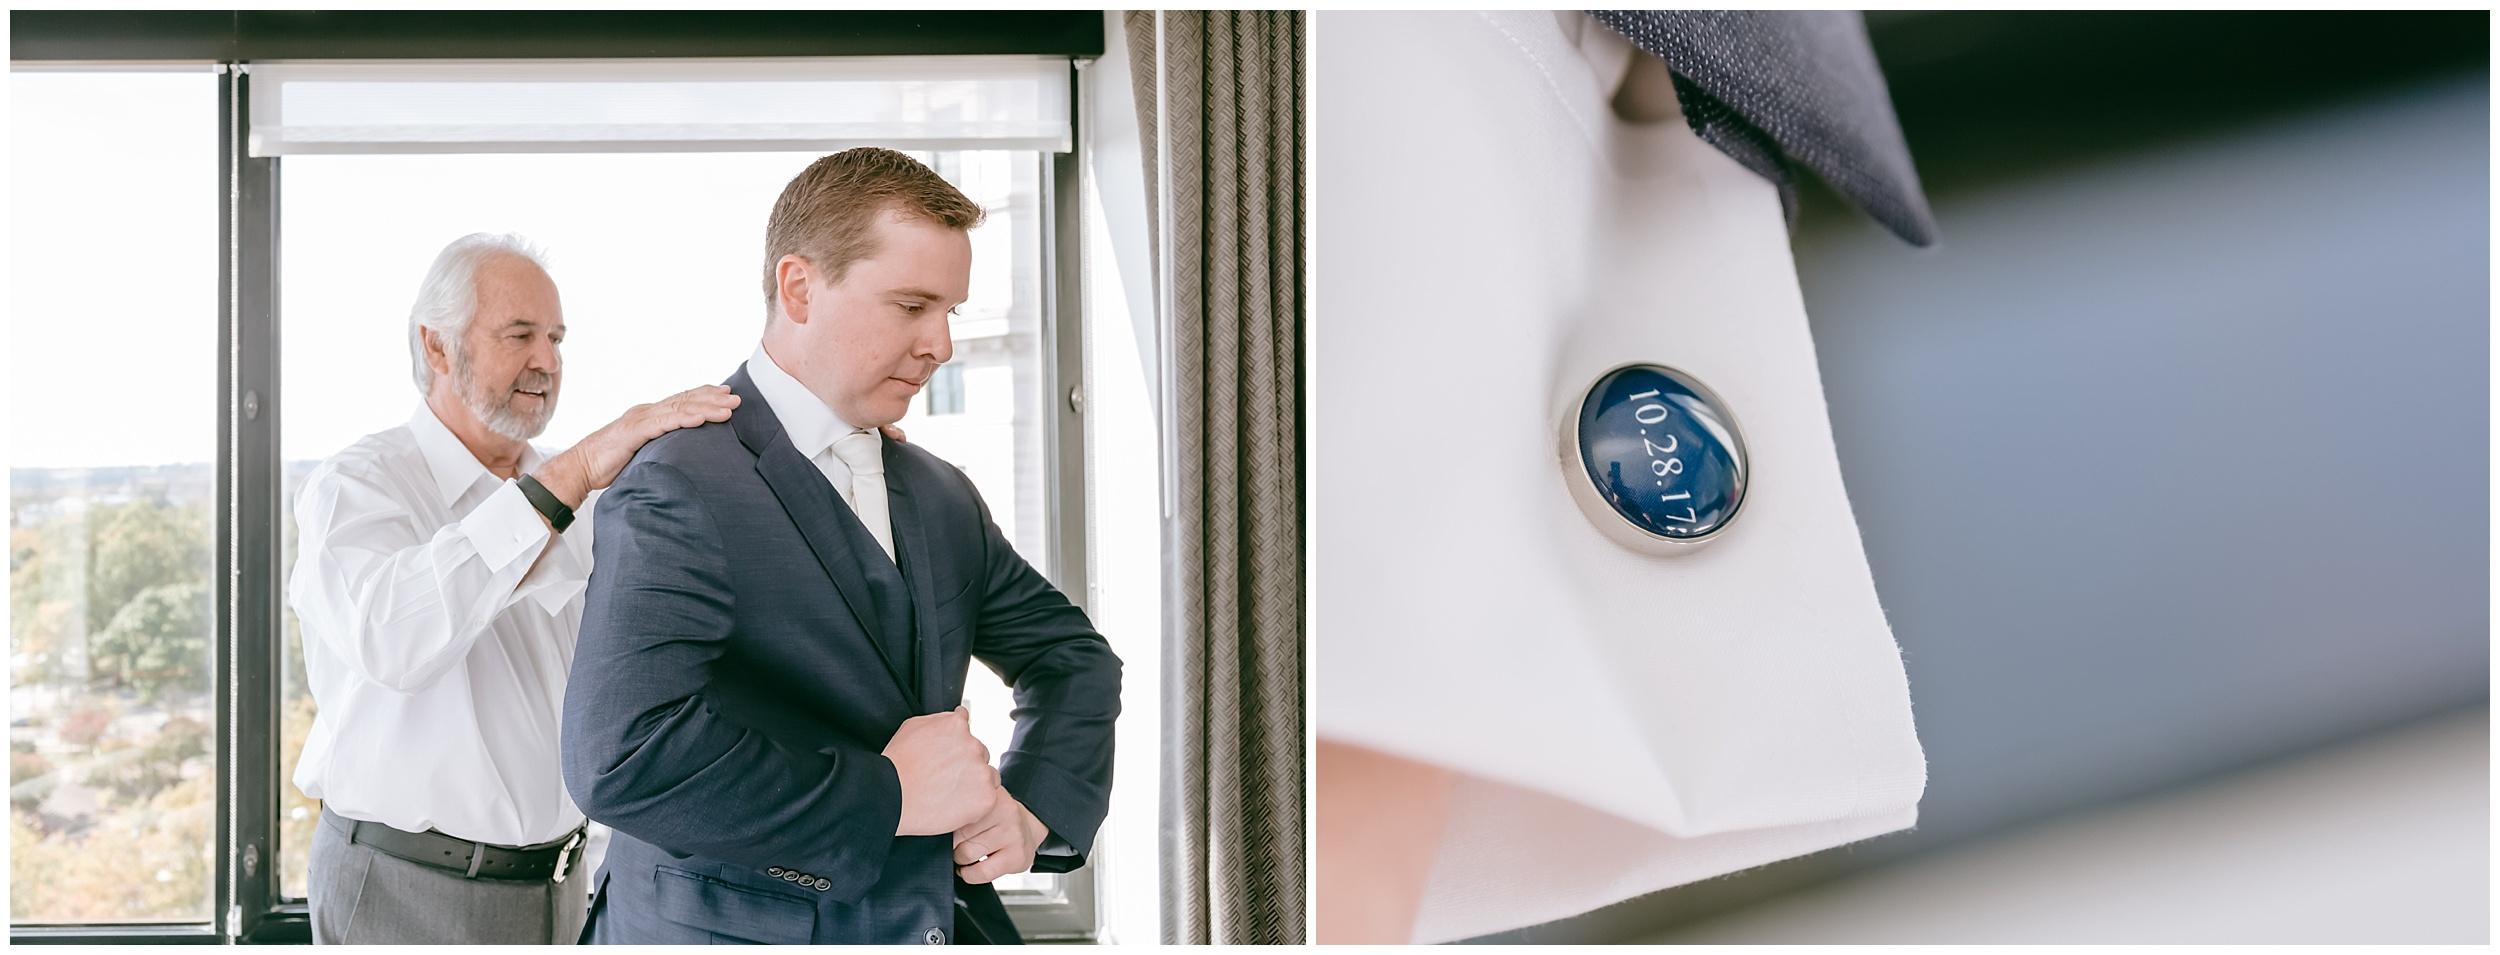 wedding-groom-portrait-window-cufflink-detail-washington-dc-photographer